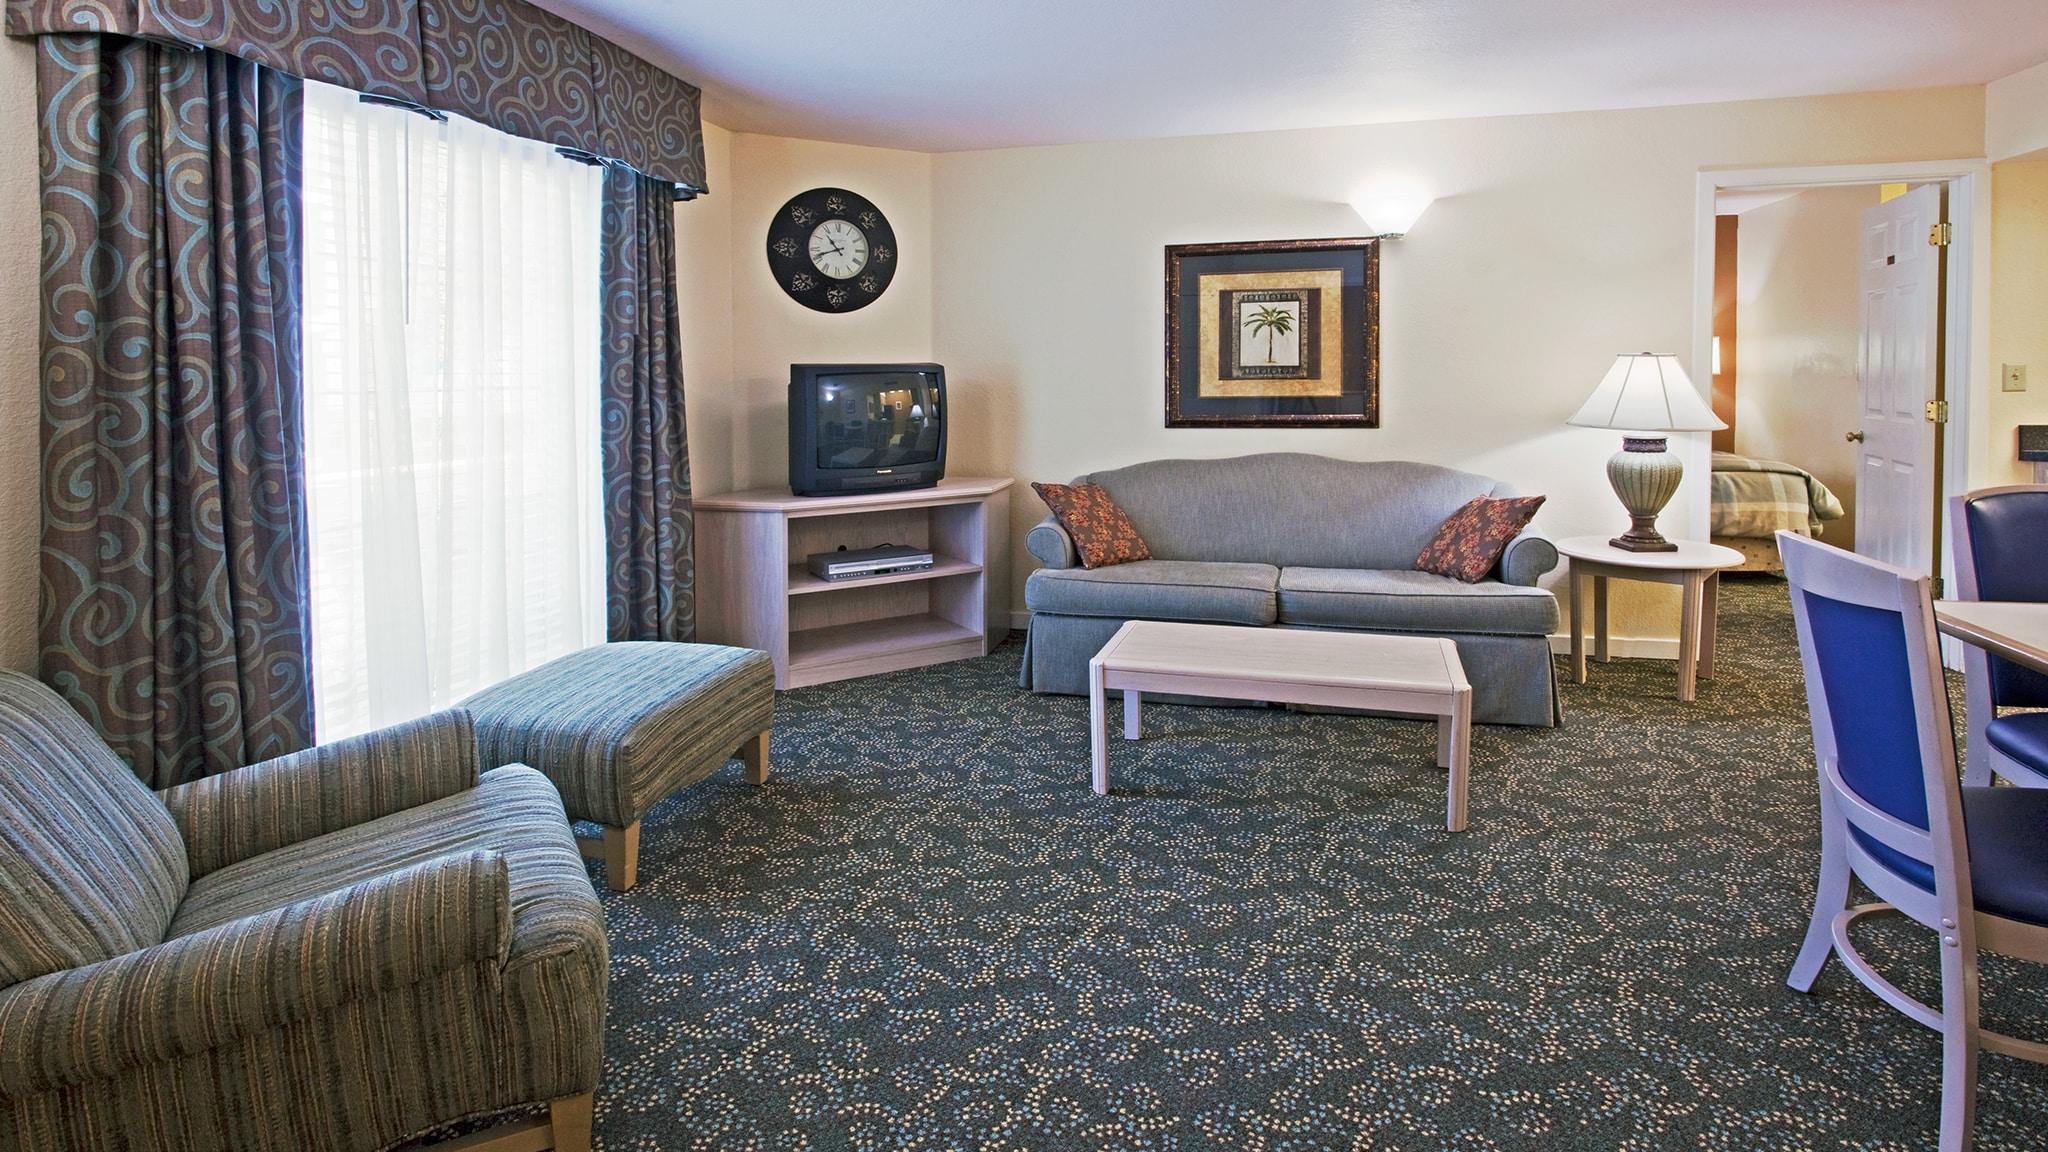 Bedroom Suites Hotel 2 Bedroom Suites Orlando